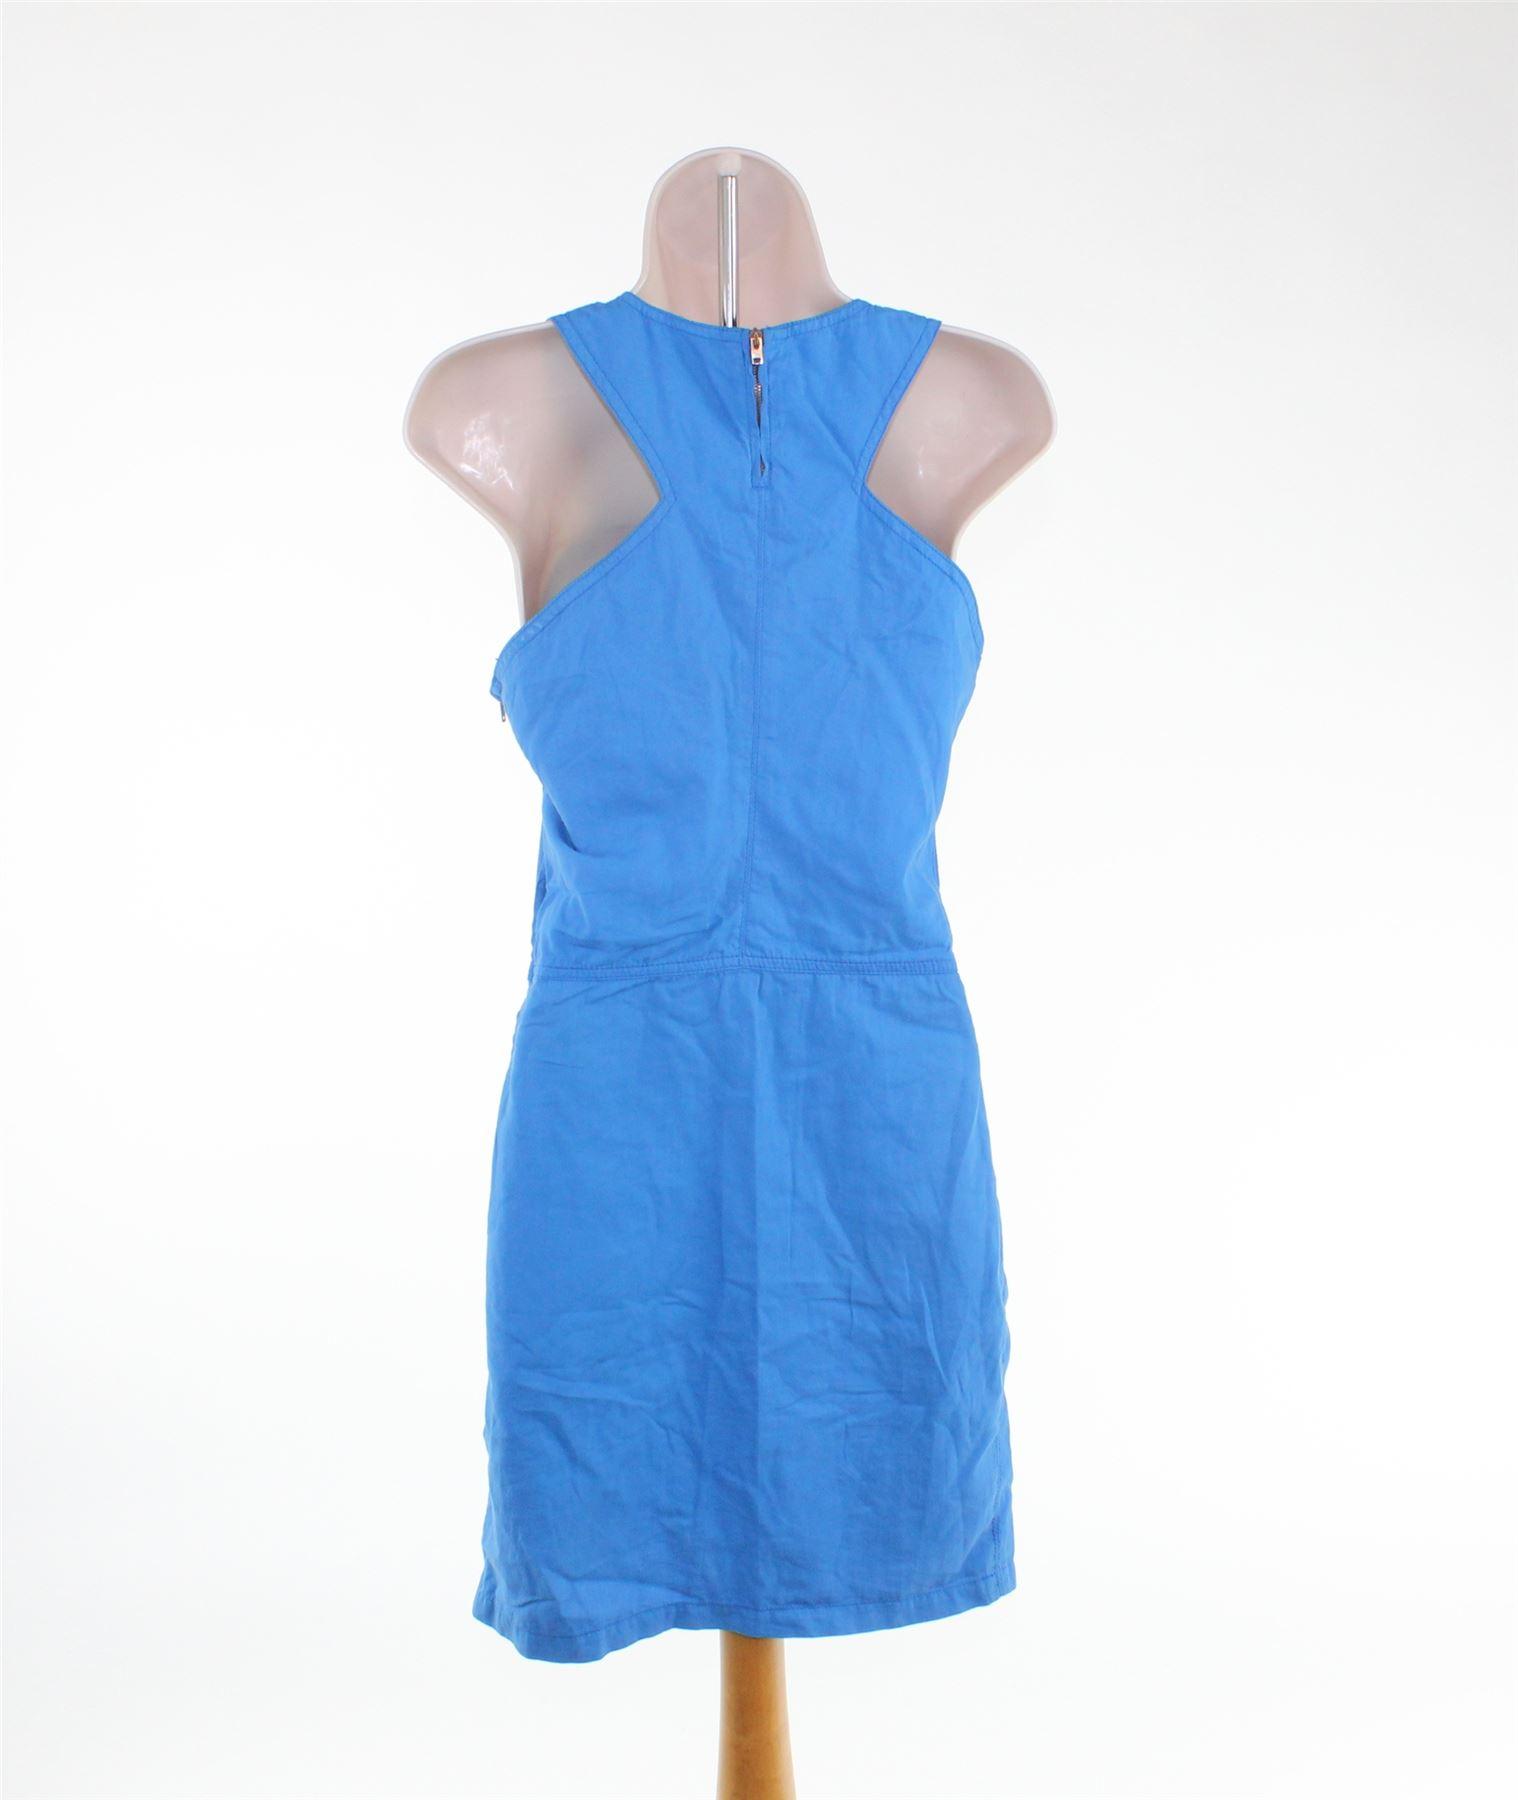 49dd1ae1dfe7 STELLA MCCARTNEY Vestito blu